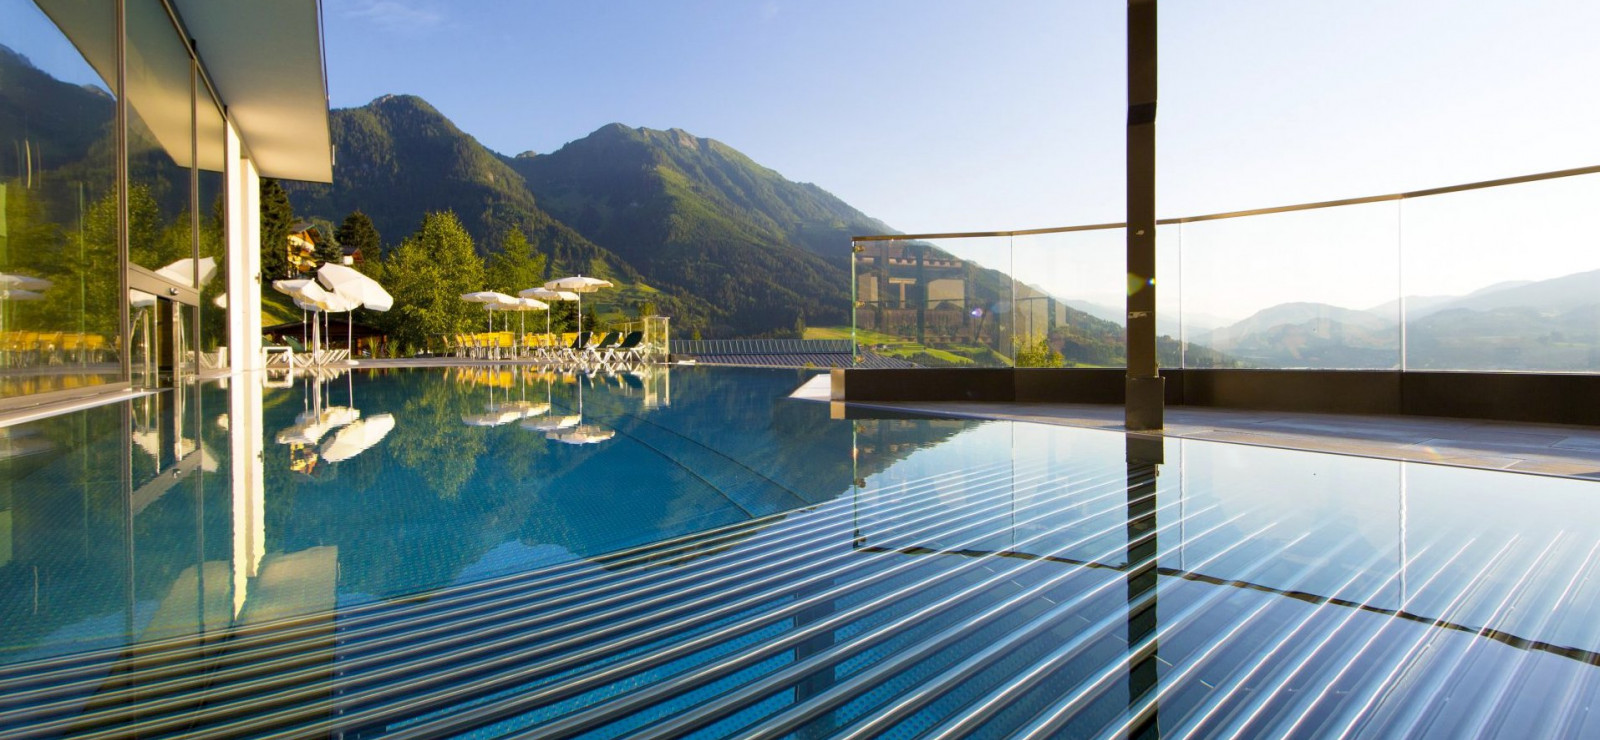 Alpina Family, Spa & Sporthotel Bilder | Bild 1